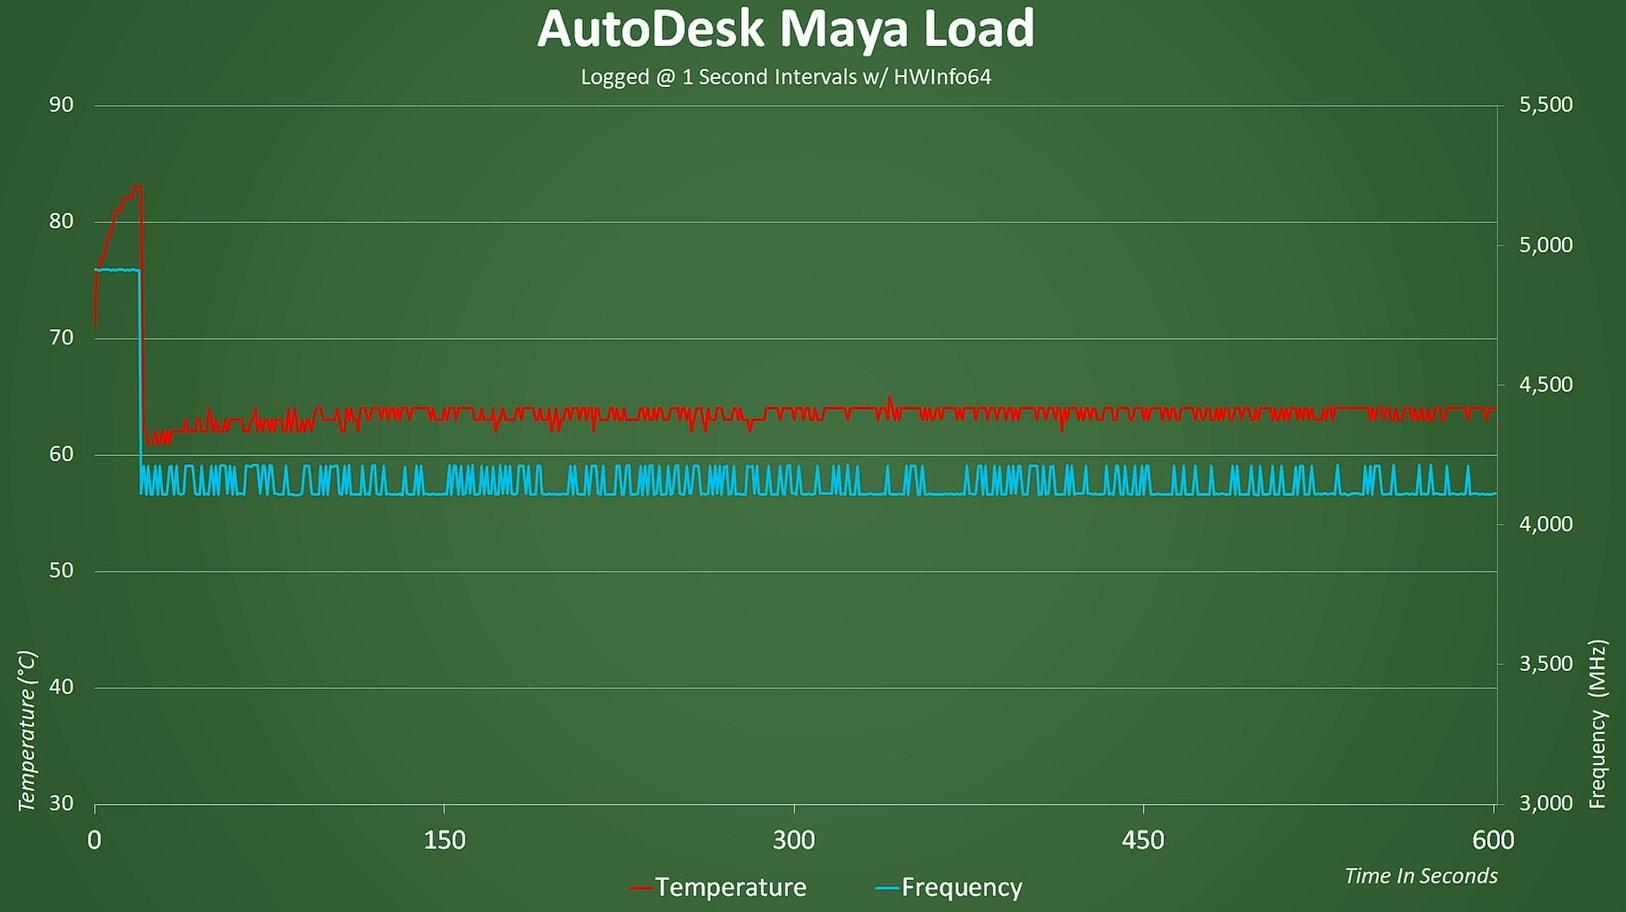 AutoDesk Maya Load